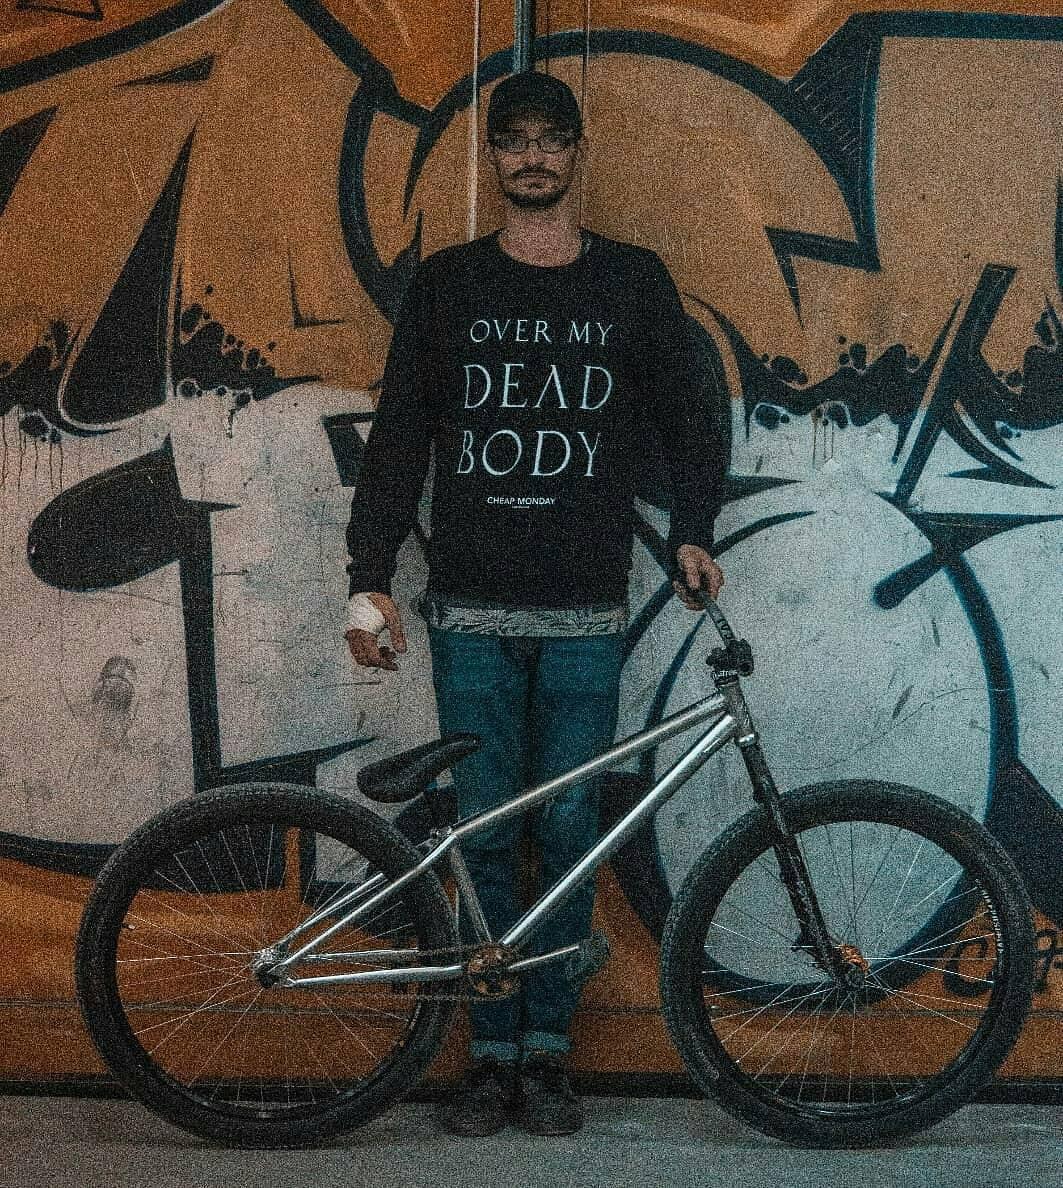 B I K E C H E C K S O O N 🙏 by @doman.andrei 📷 : @marco.ghica #bike #check #mtbstreet #mtbstreet #mtbpower #mtblife #soon #mainframe #pridestreet @pridestreet @bikedistrict – #psbikes